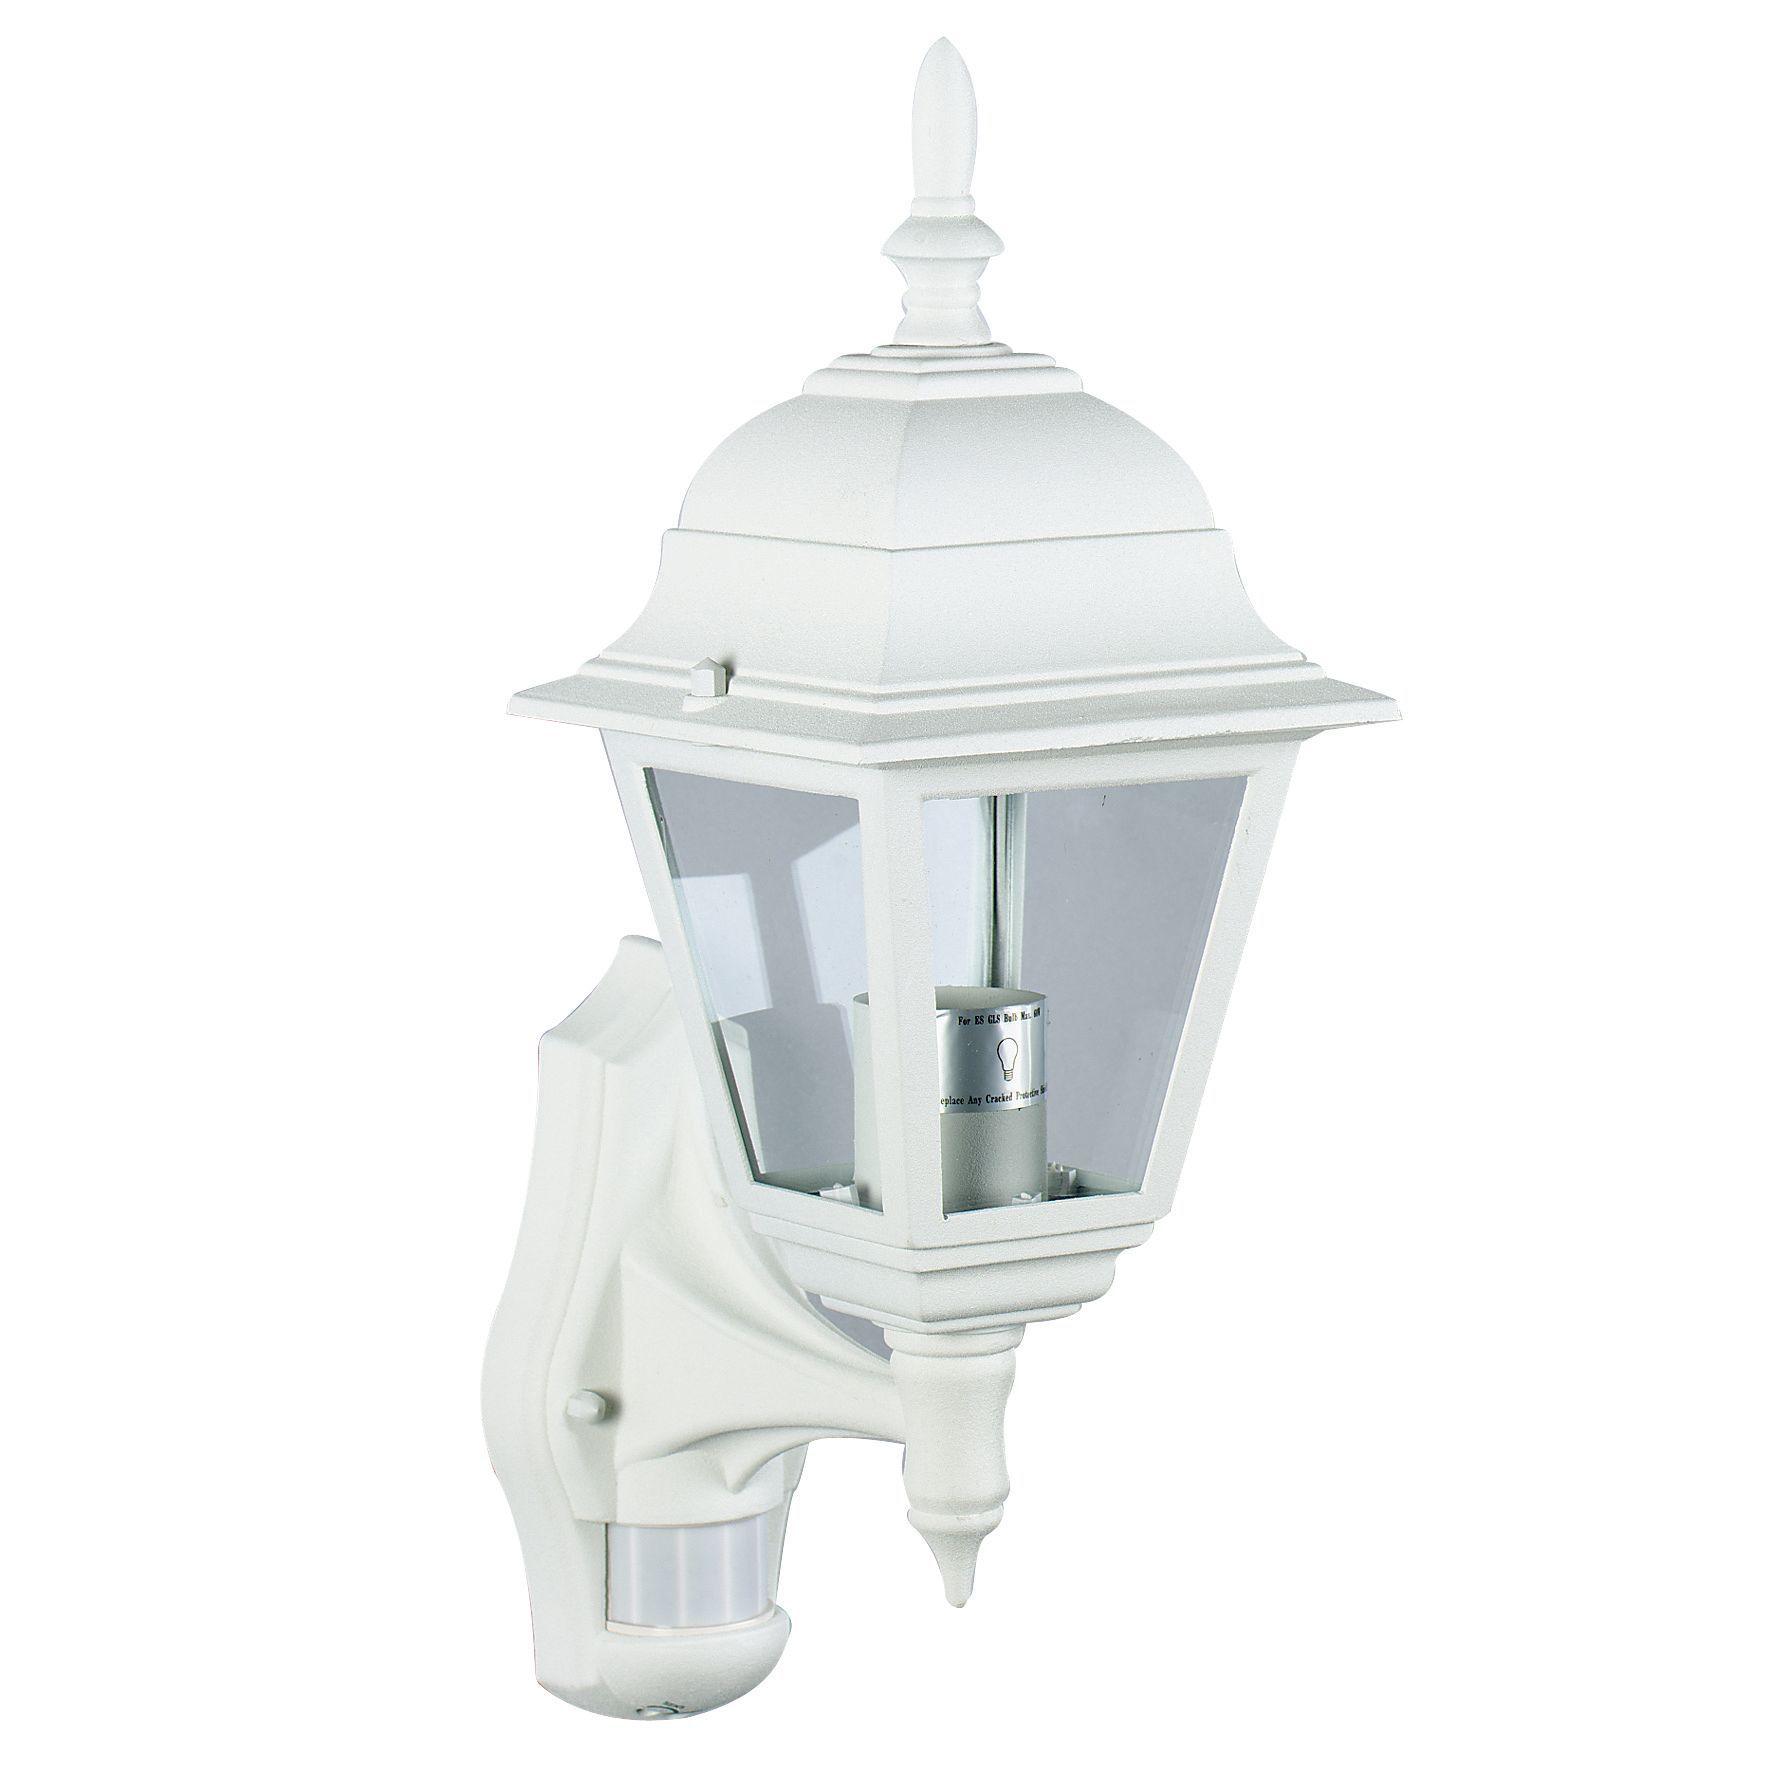 Polperro White 60W Mains Powered External Pir Lantern | Departments | DIY  at B&Q